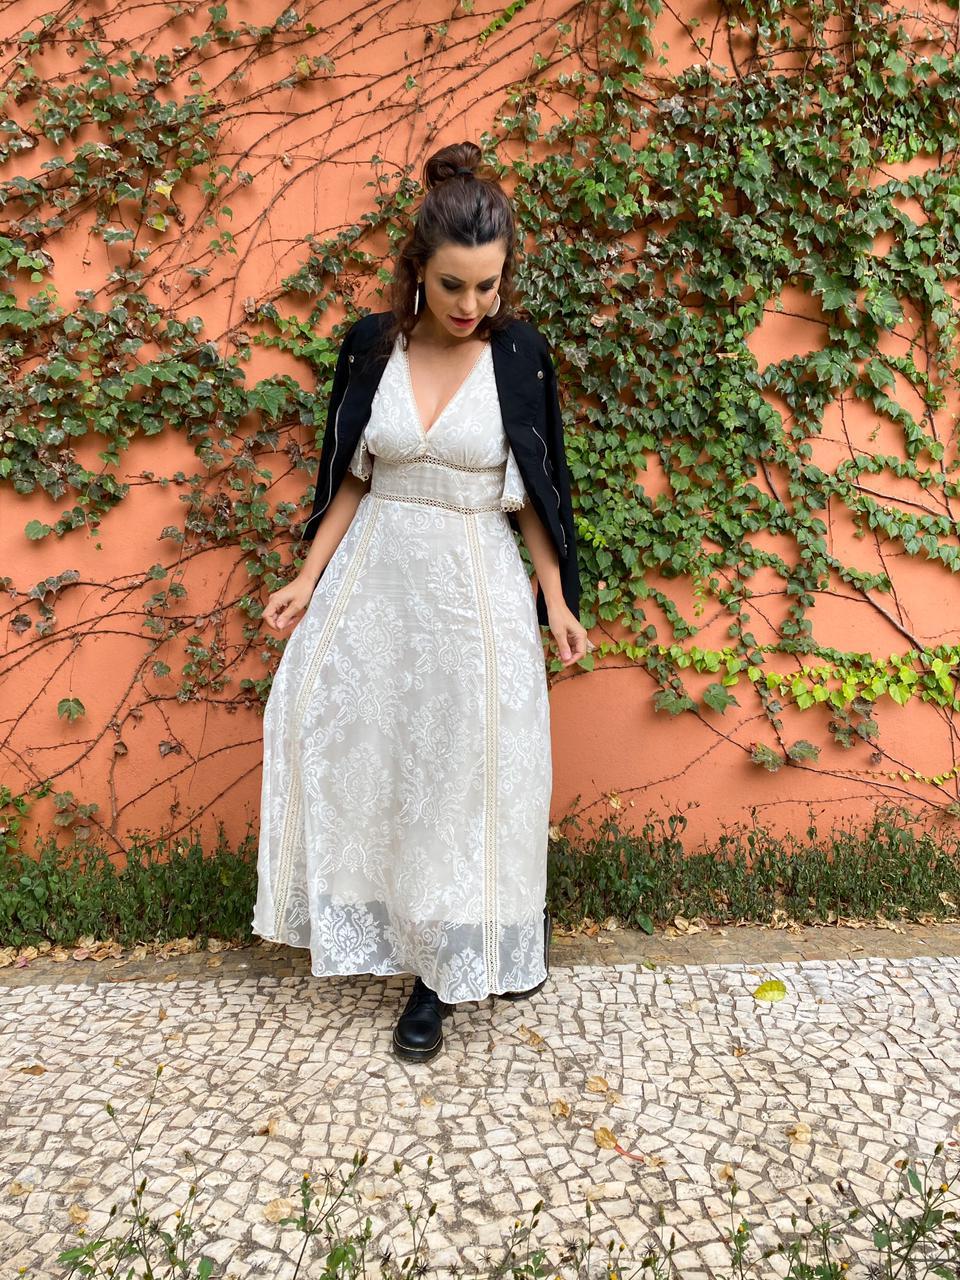 VESTIDO AS FILHAS DA MÃE GARDEN FEMININO